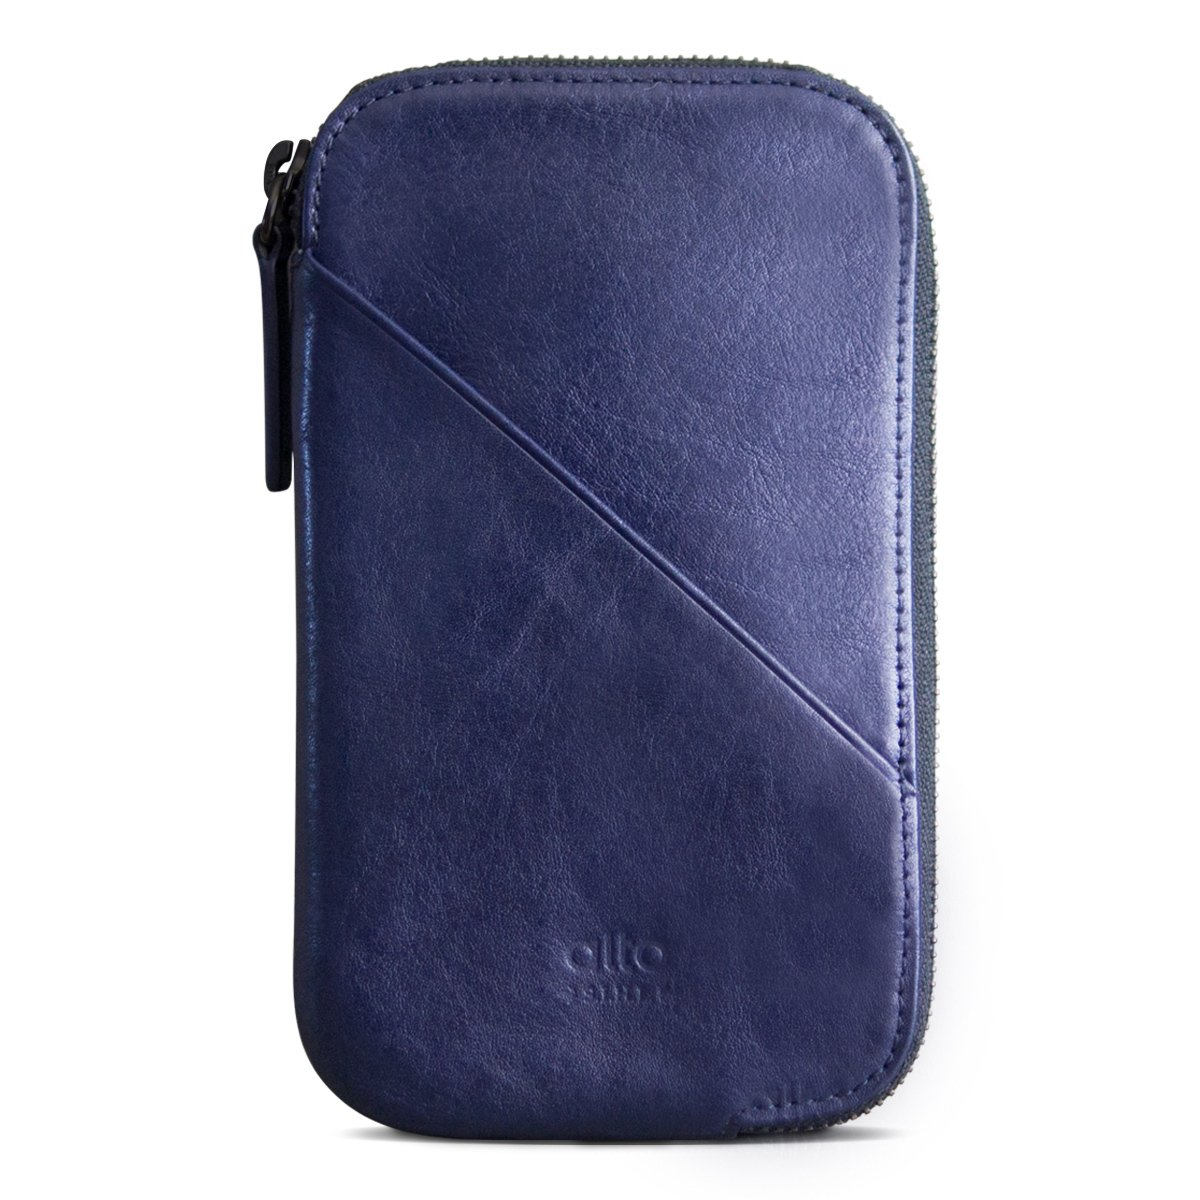 alto Handmade Premium Italian Leather for Apple iPhone 7 / iPhone 7 Plus / iPhone 8 / iPhone 8 Plus / iPhone X Travel Phone Wallet (Navy)